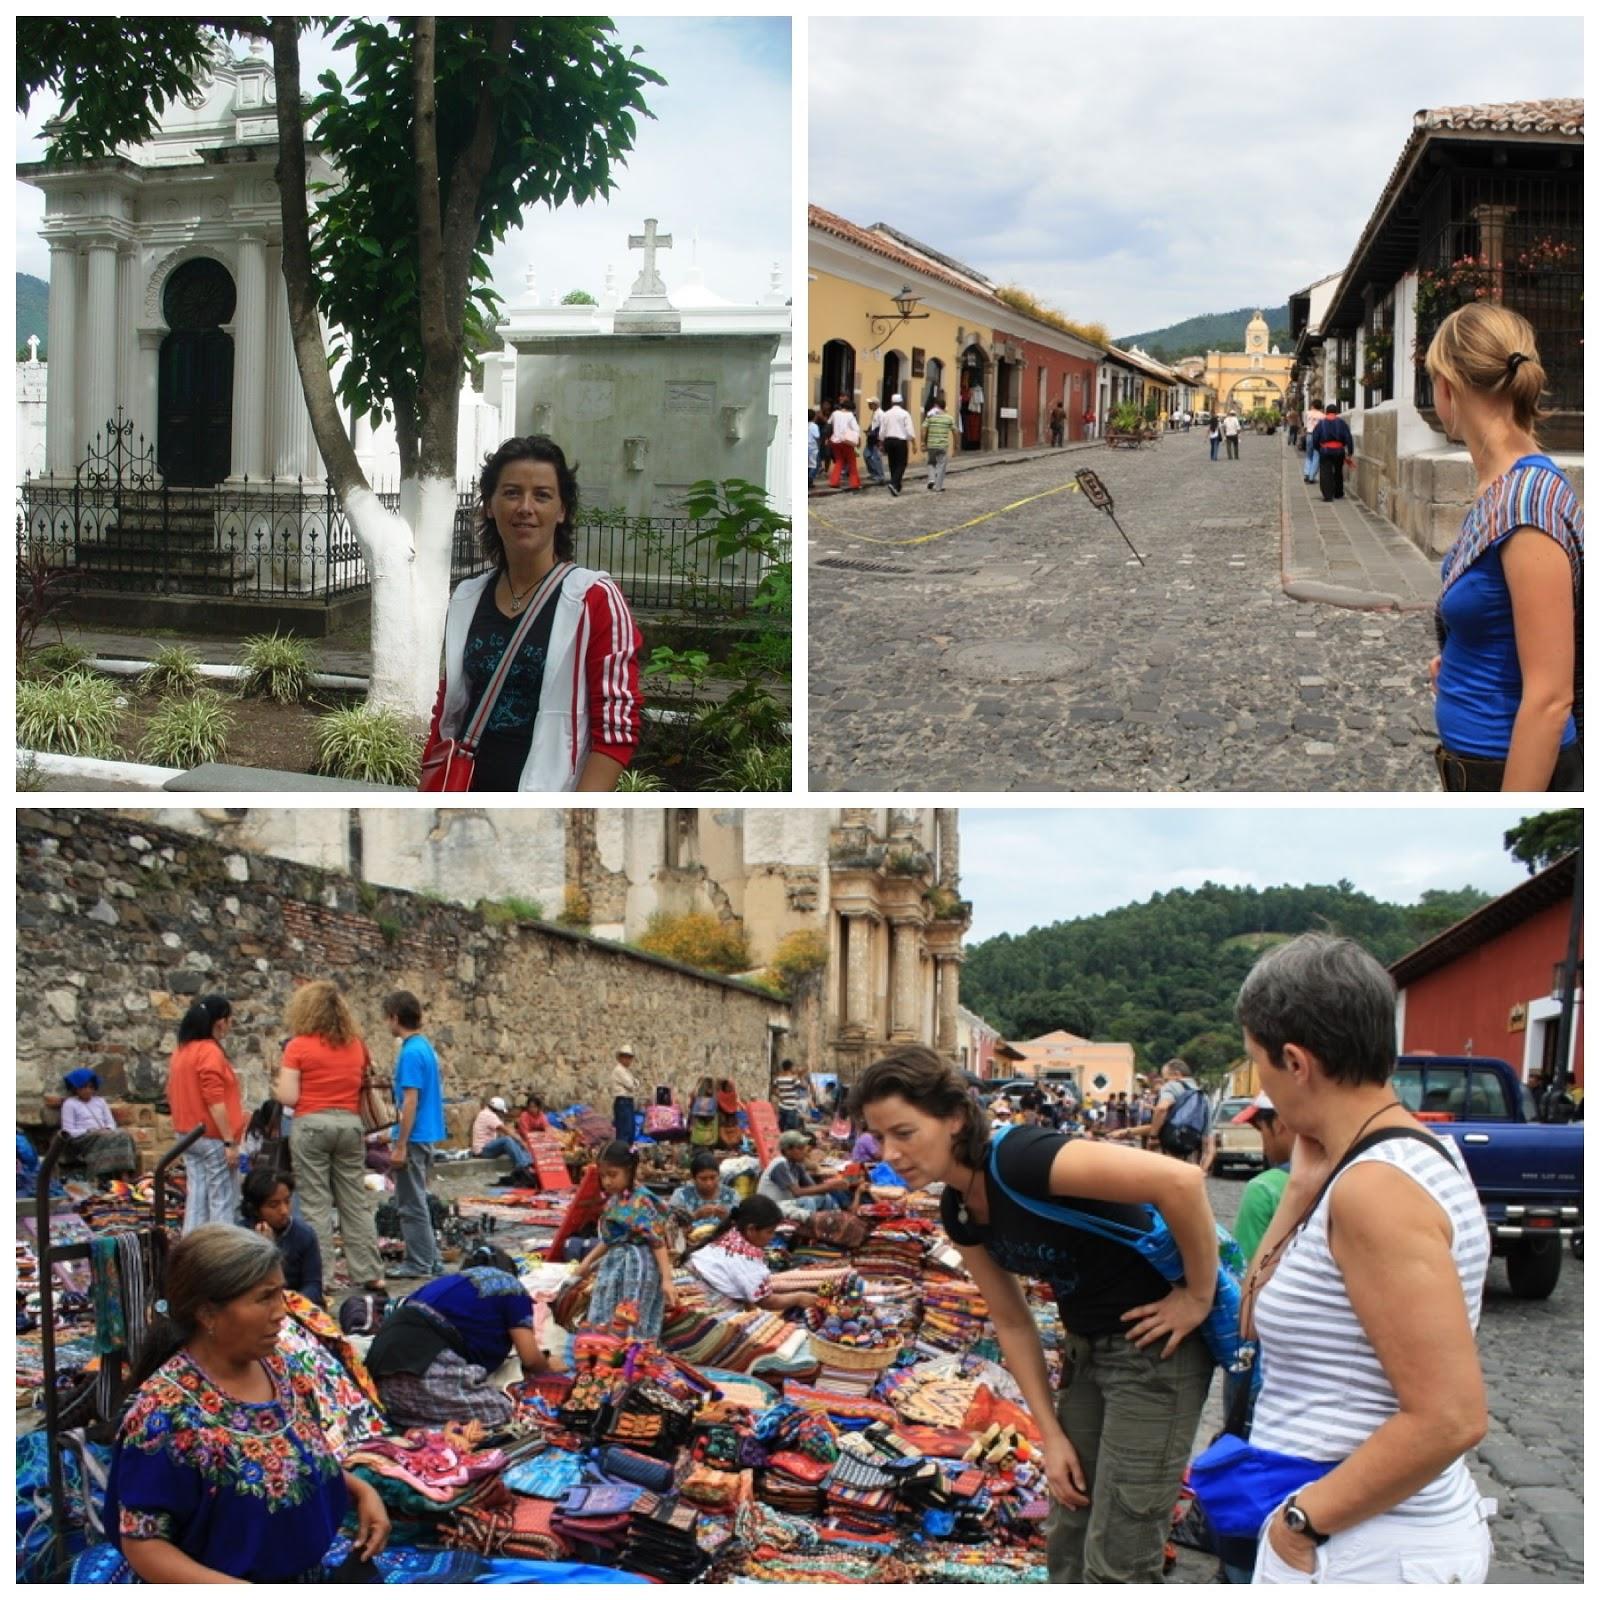 Guatemala - Travel and Tourism | export.gov